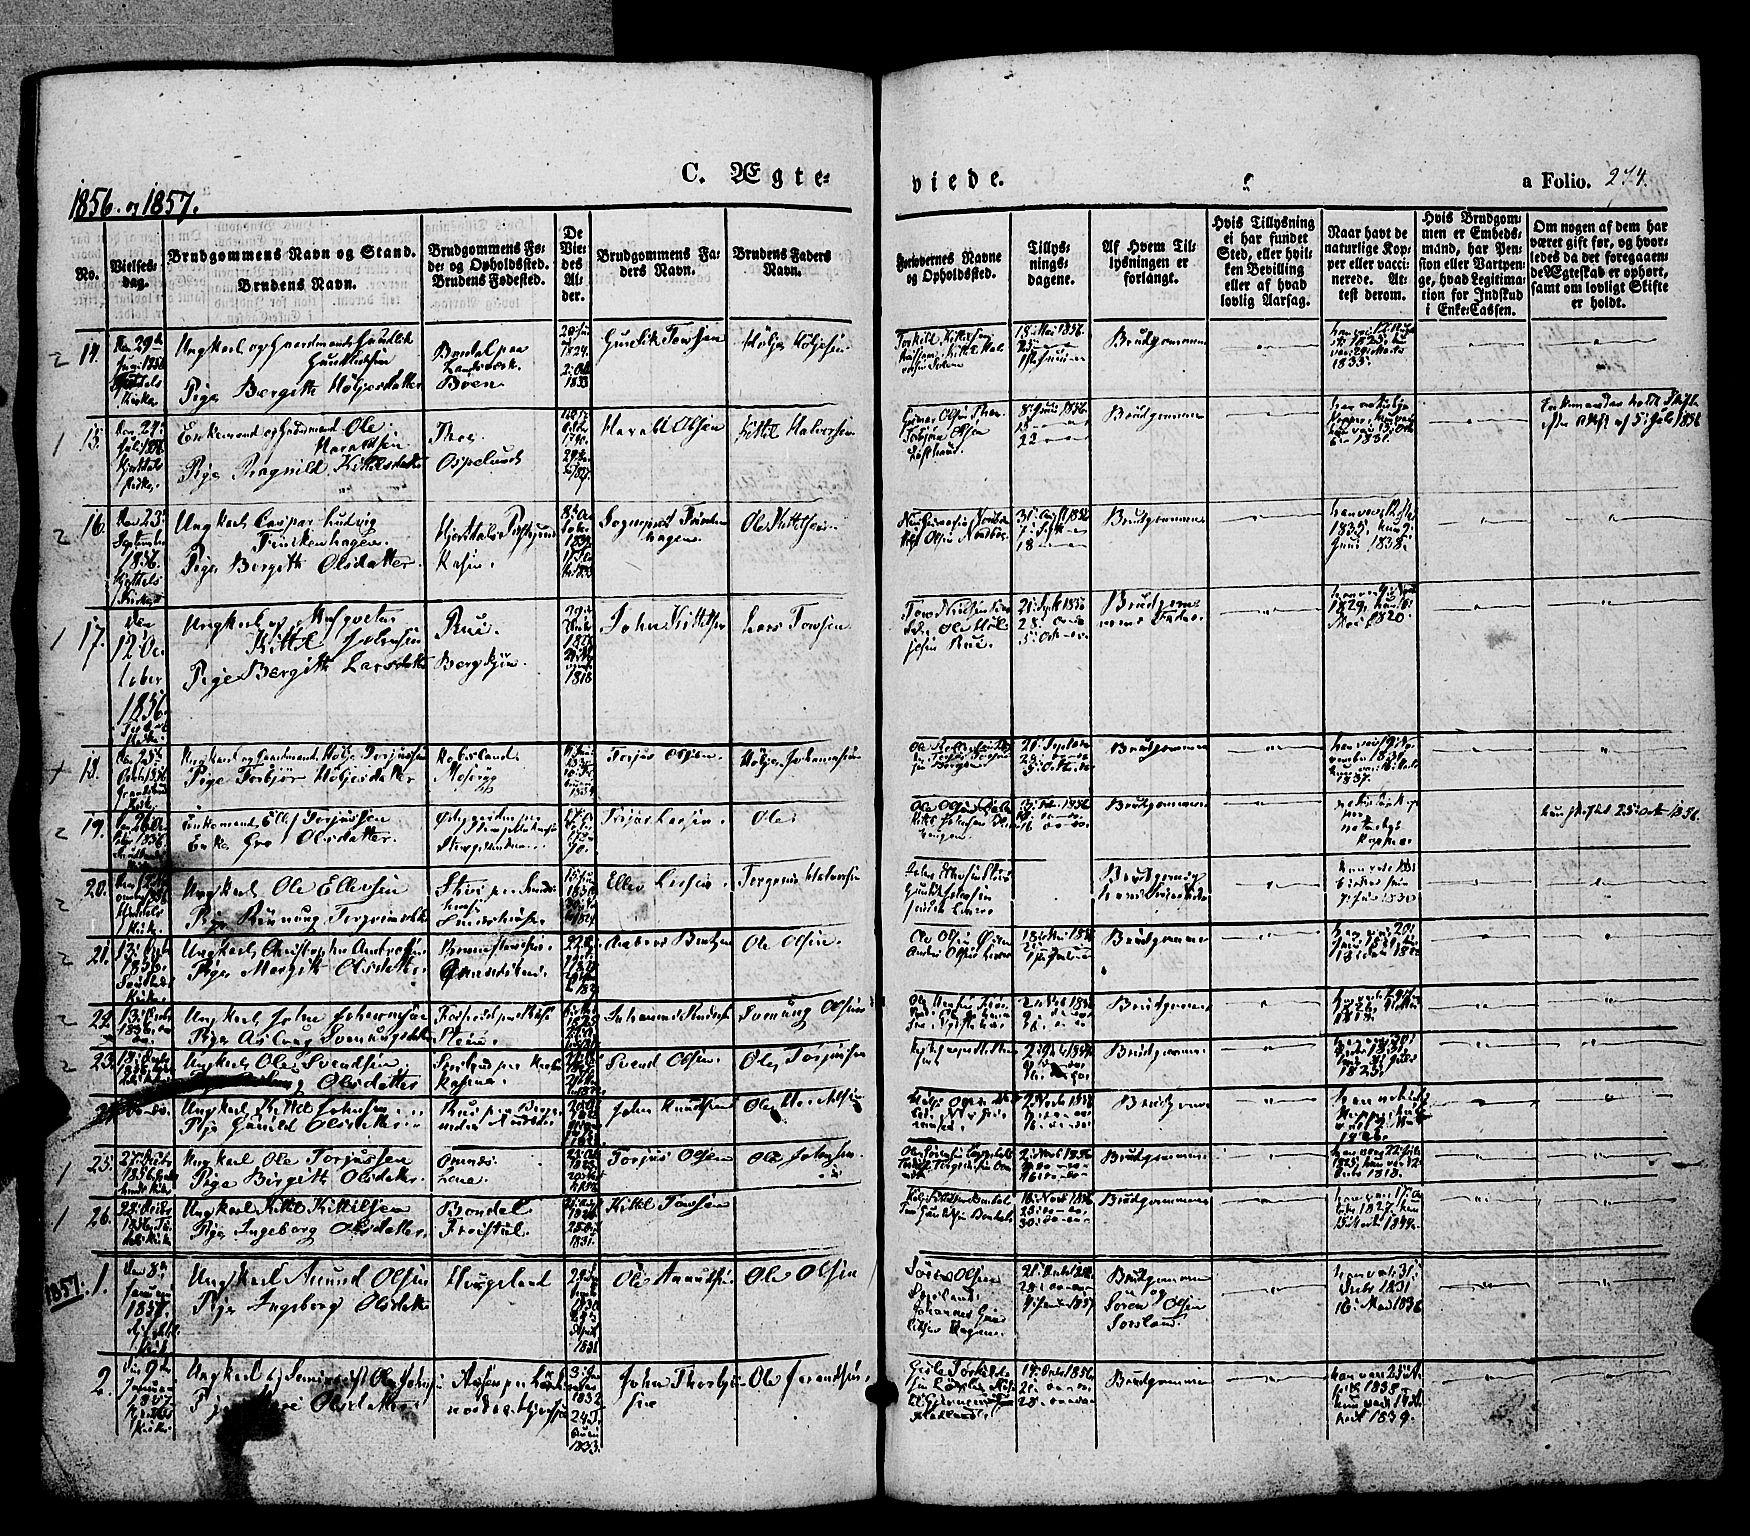 SAKO, Hjartdal kirkebøker, F/Fa/L0008: Ministerialbok nr. I 8, 1844-1859, s. 274